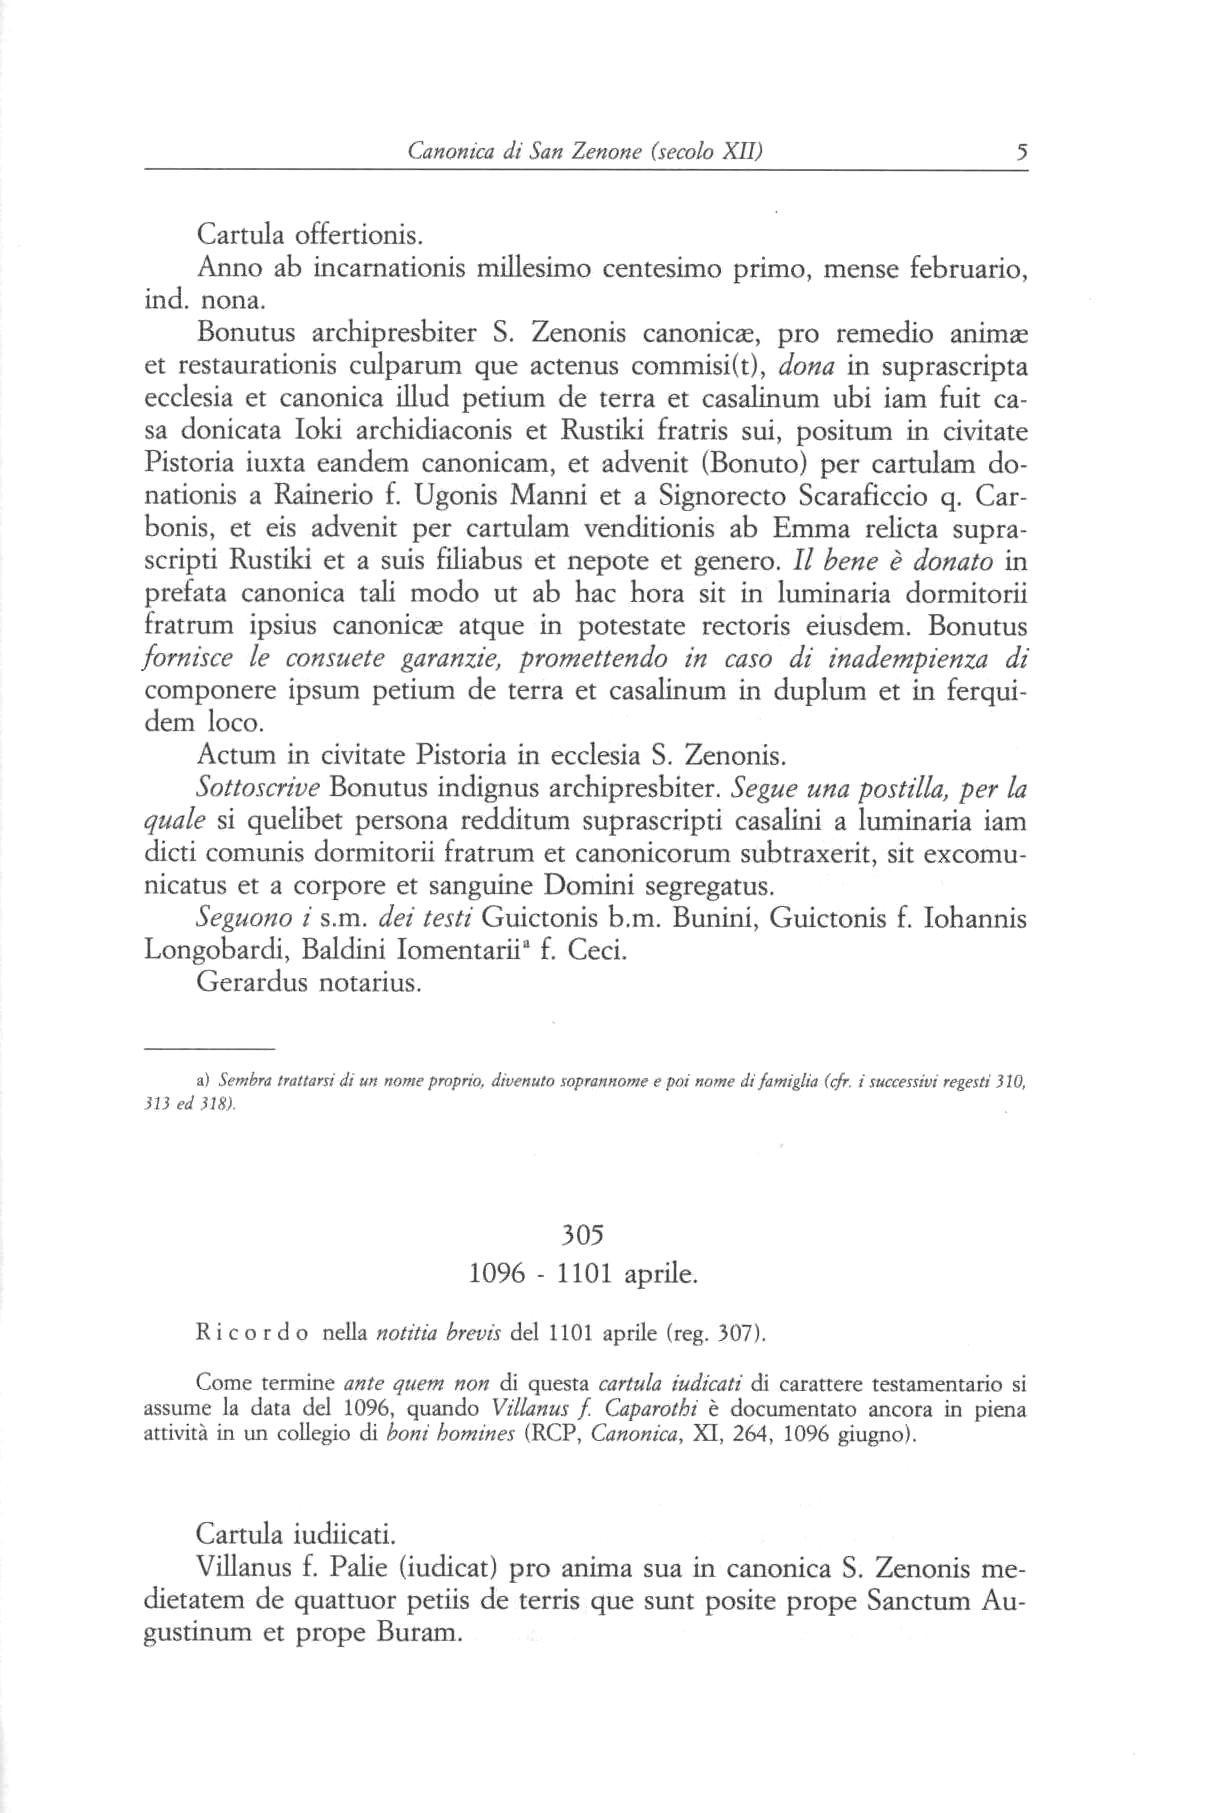 Canonica S. Zenone XII 0005.jpg